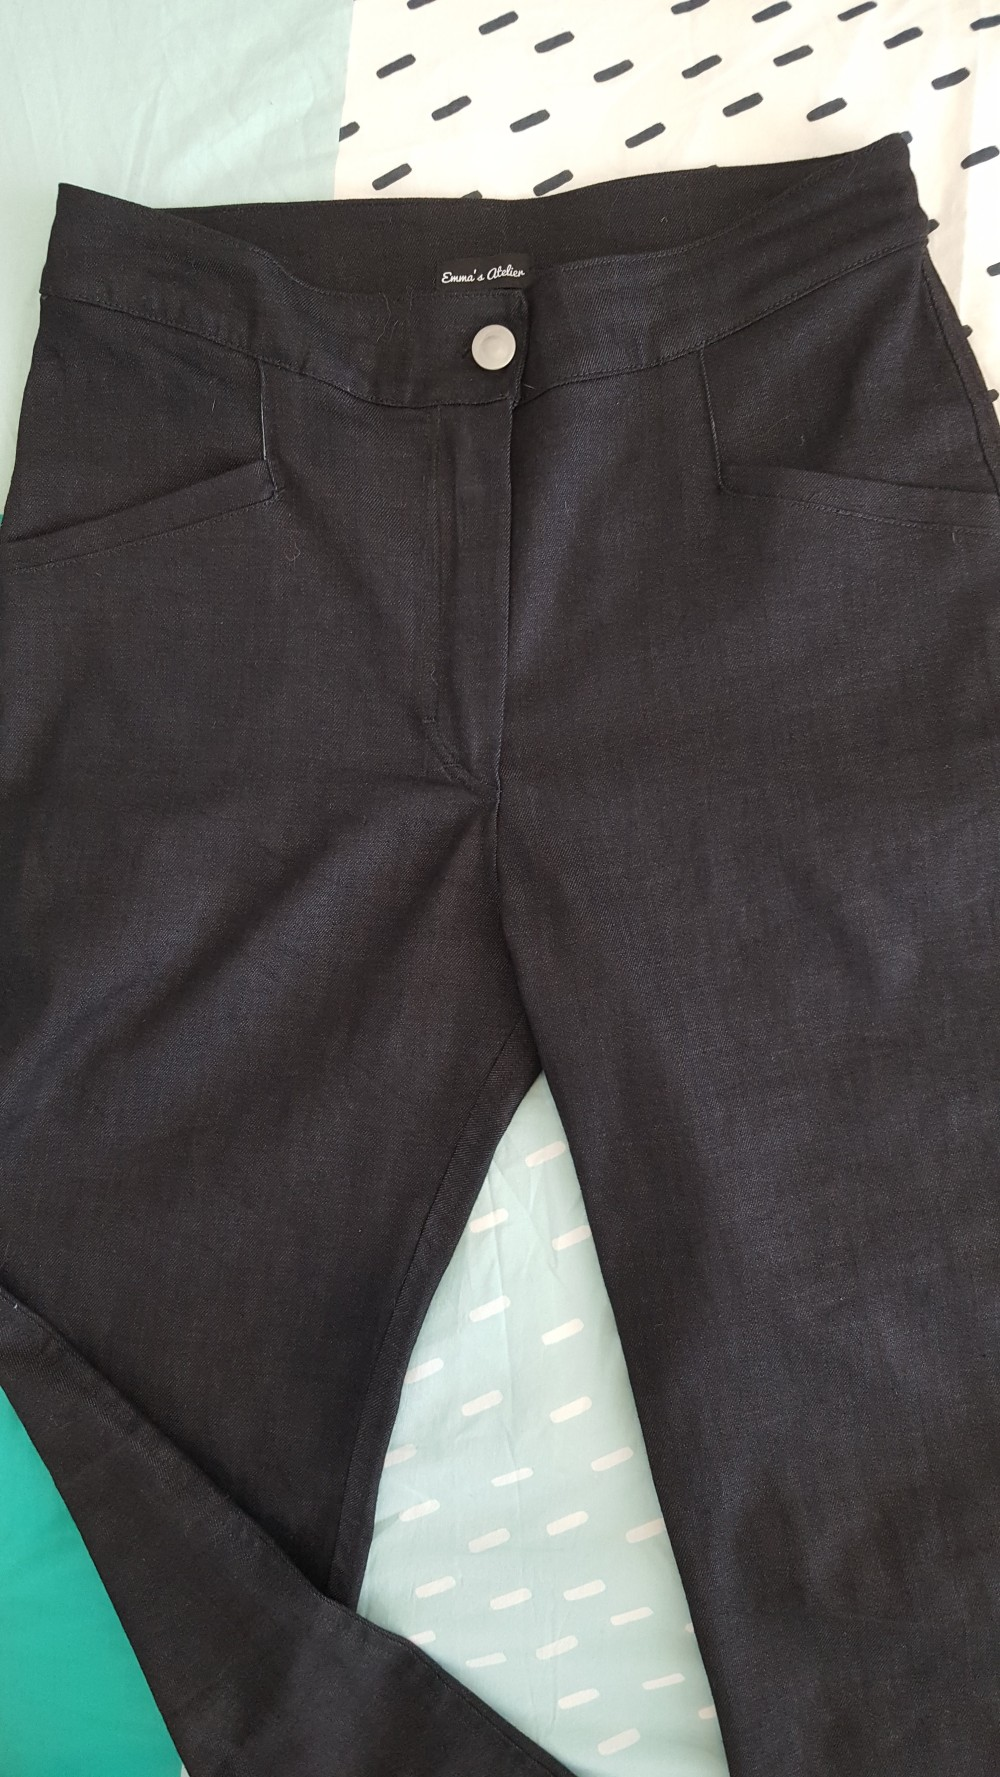 e6ca445dbd Safran Jeans – Emma s Atelier